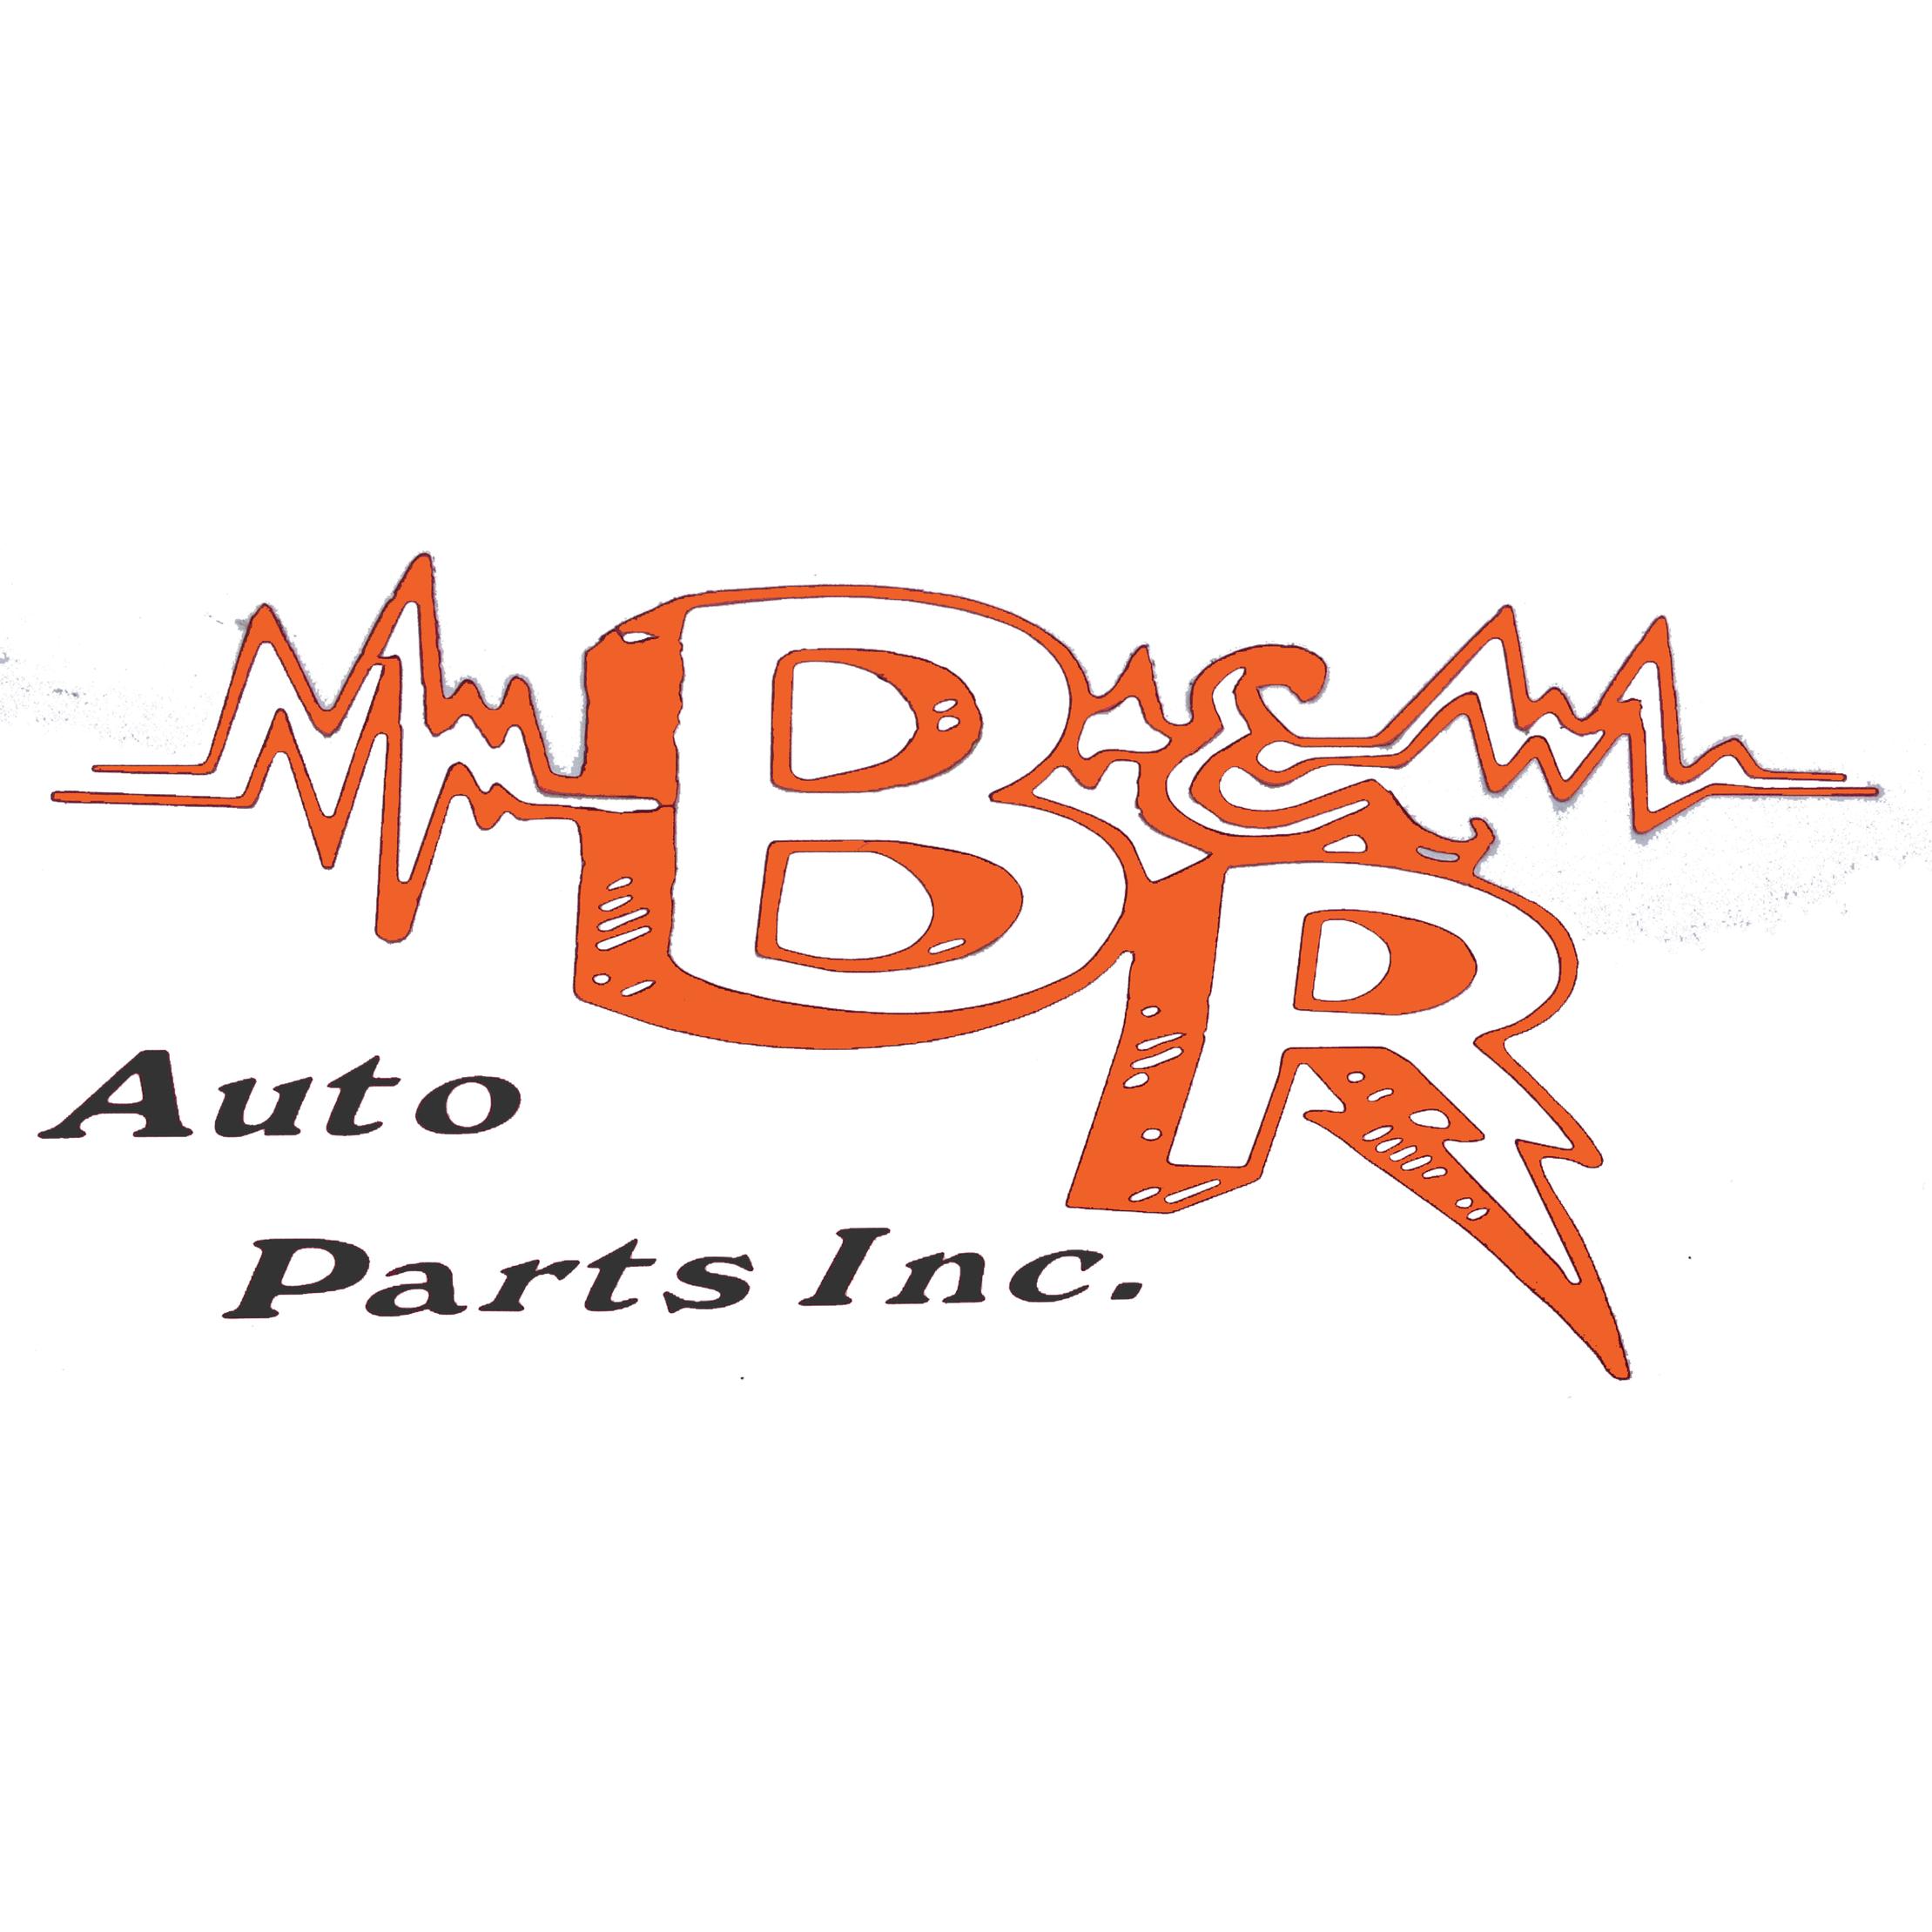 B & R Auto Parts Inc